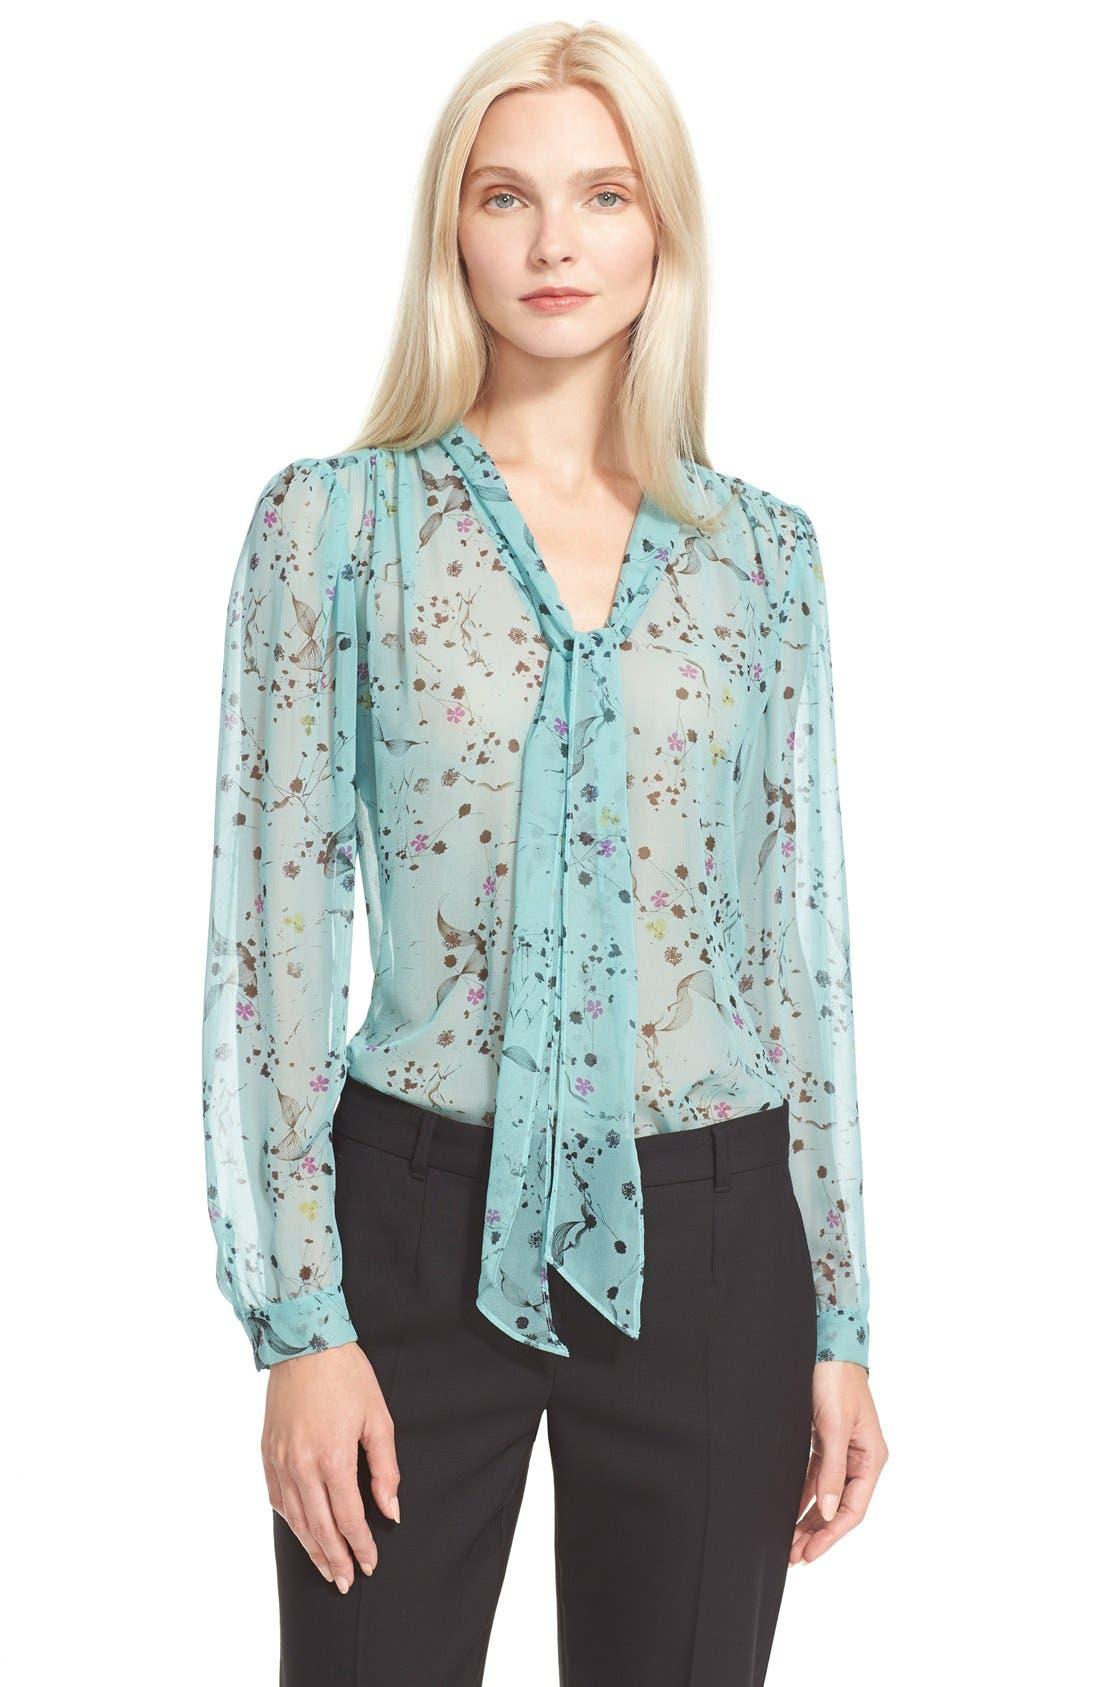 REBECCA TAYLOR Floral Print Tie Neck Top, Main, color, 318